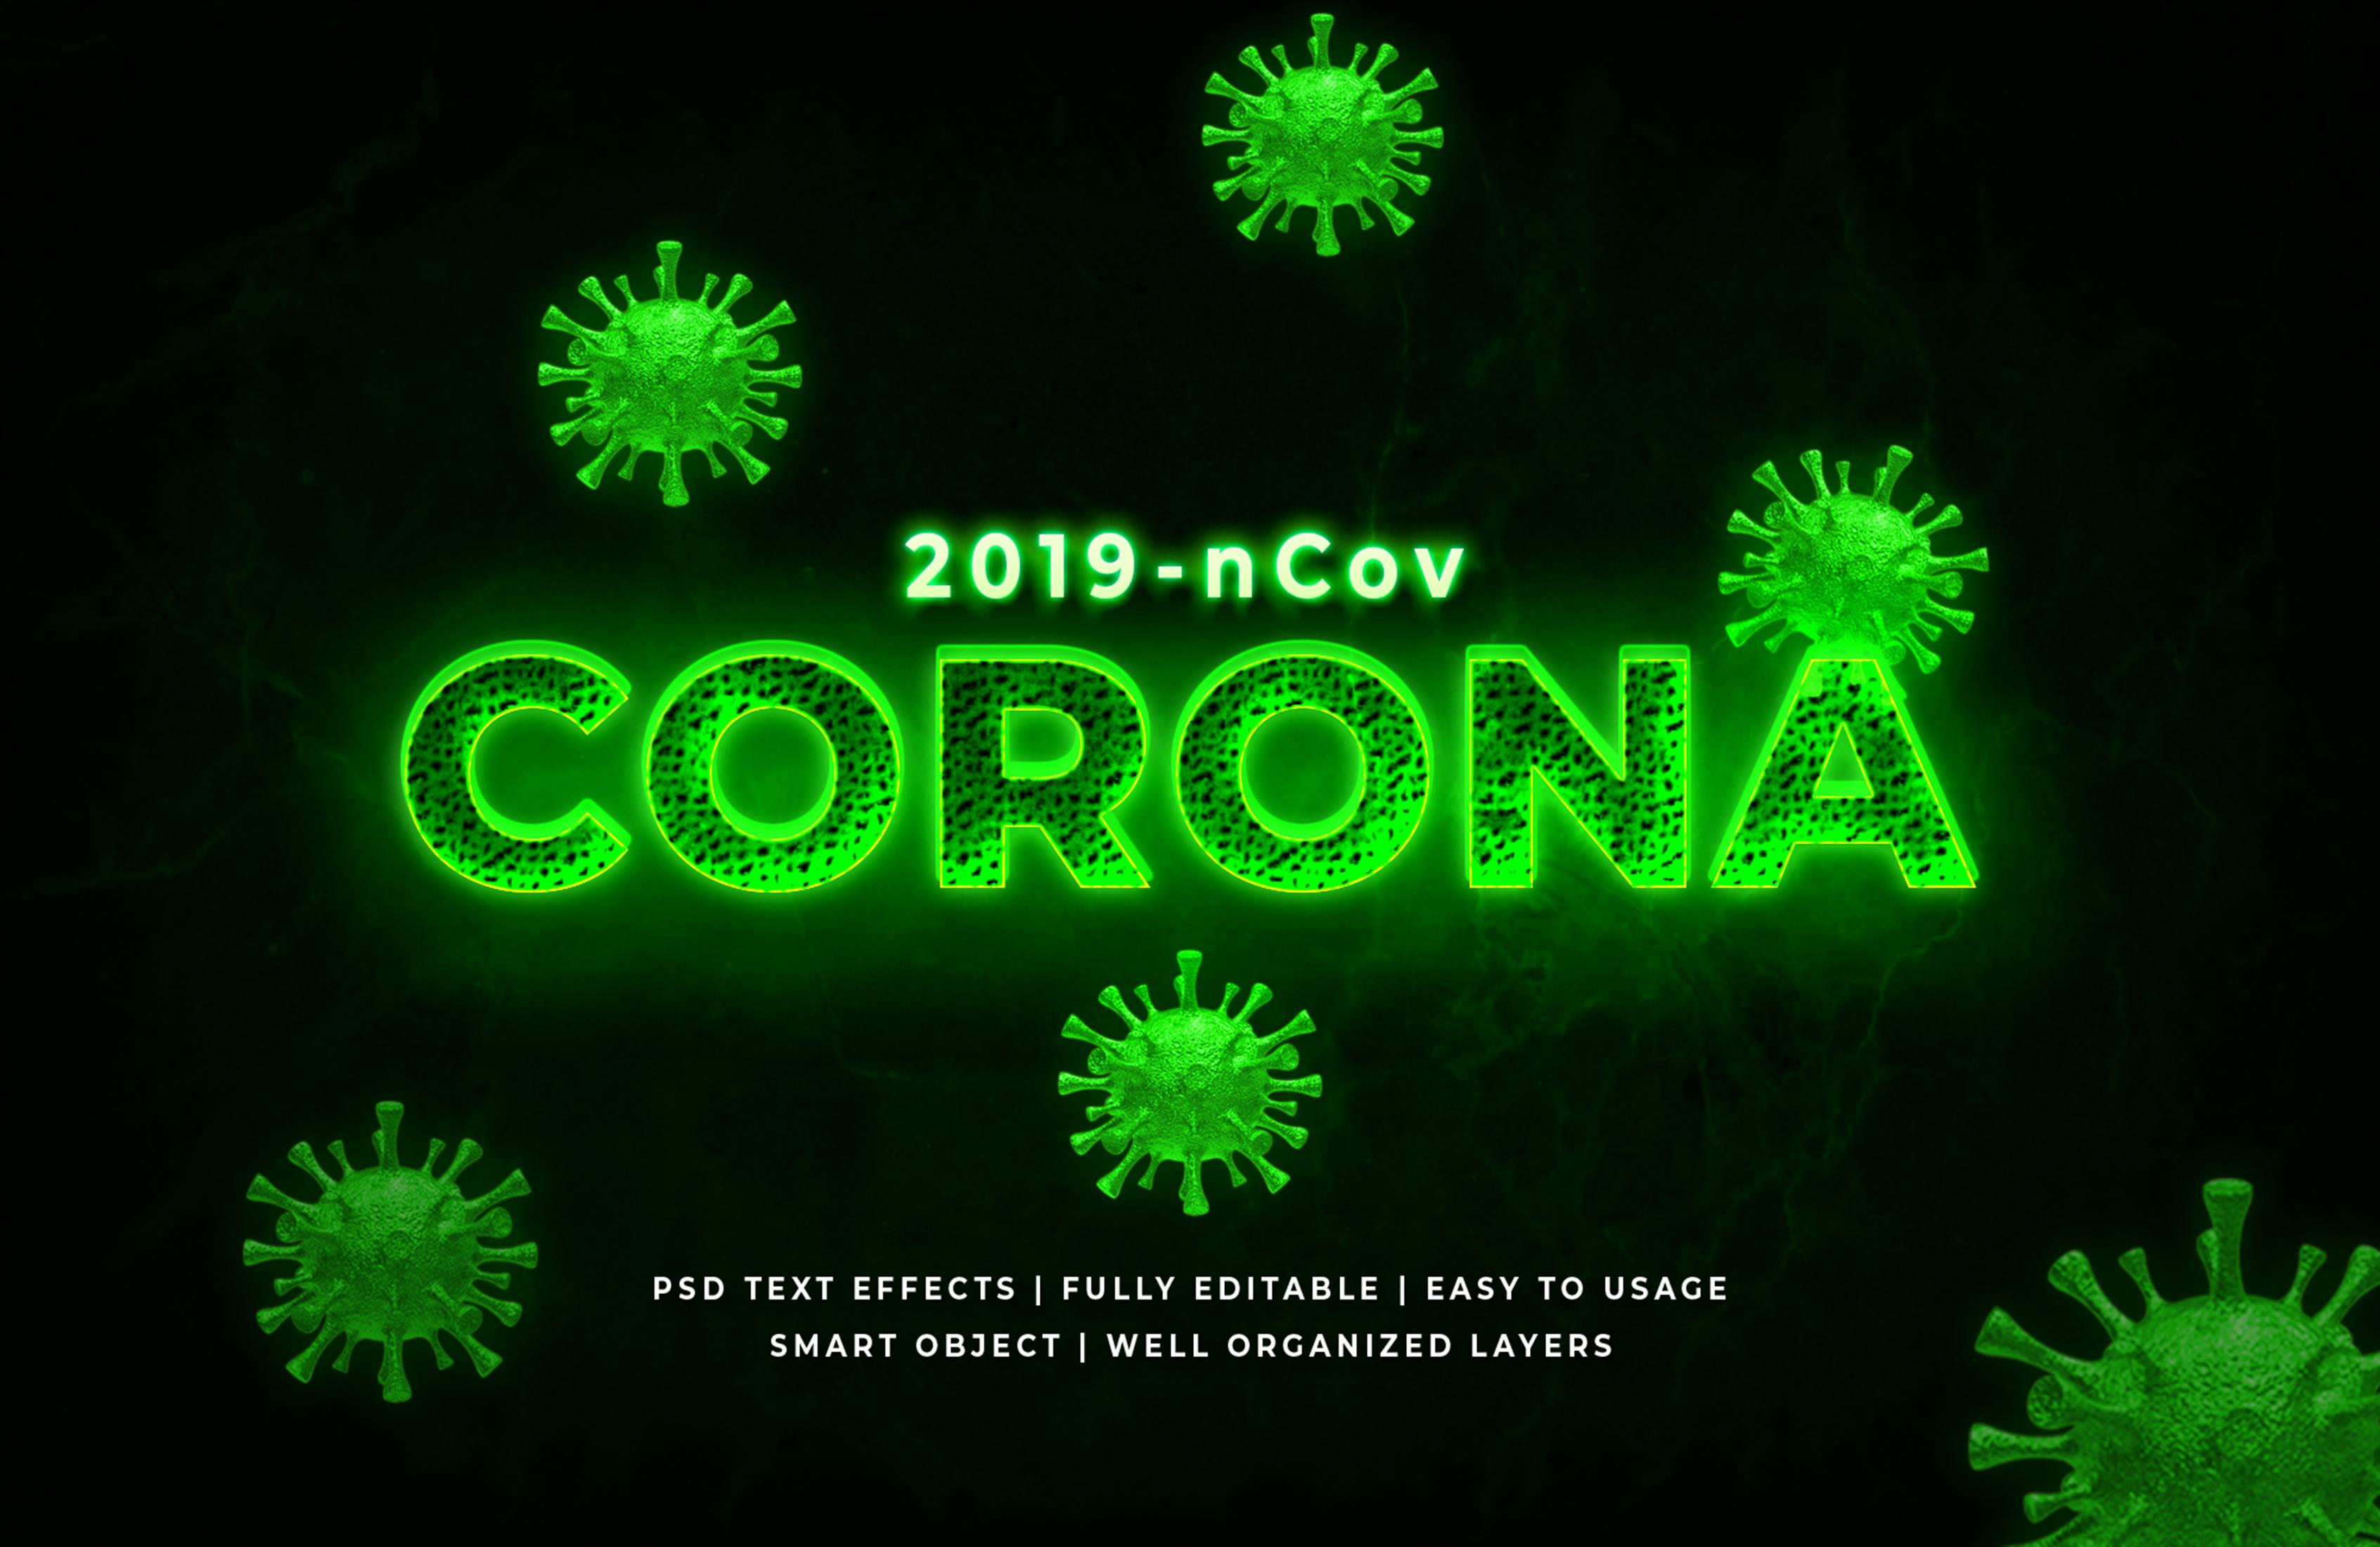 corona virus text style effect mockup by syifa5610